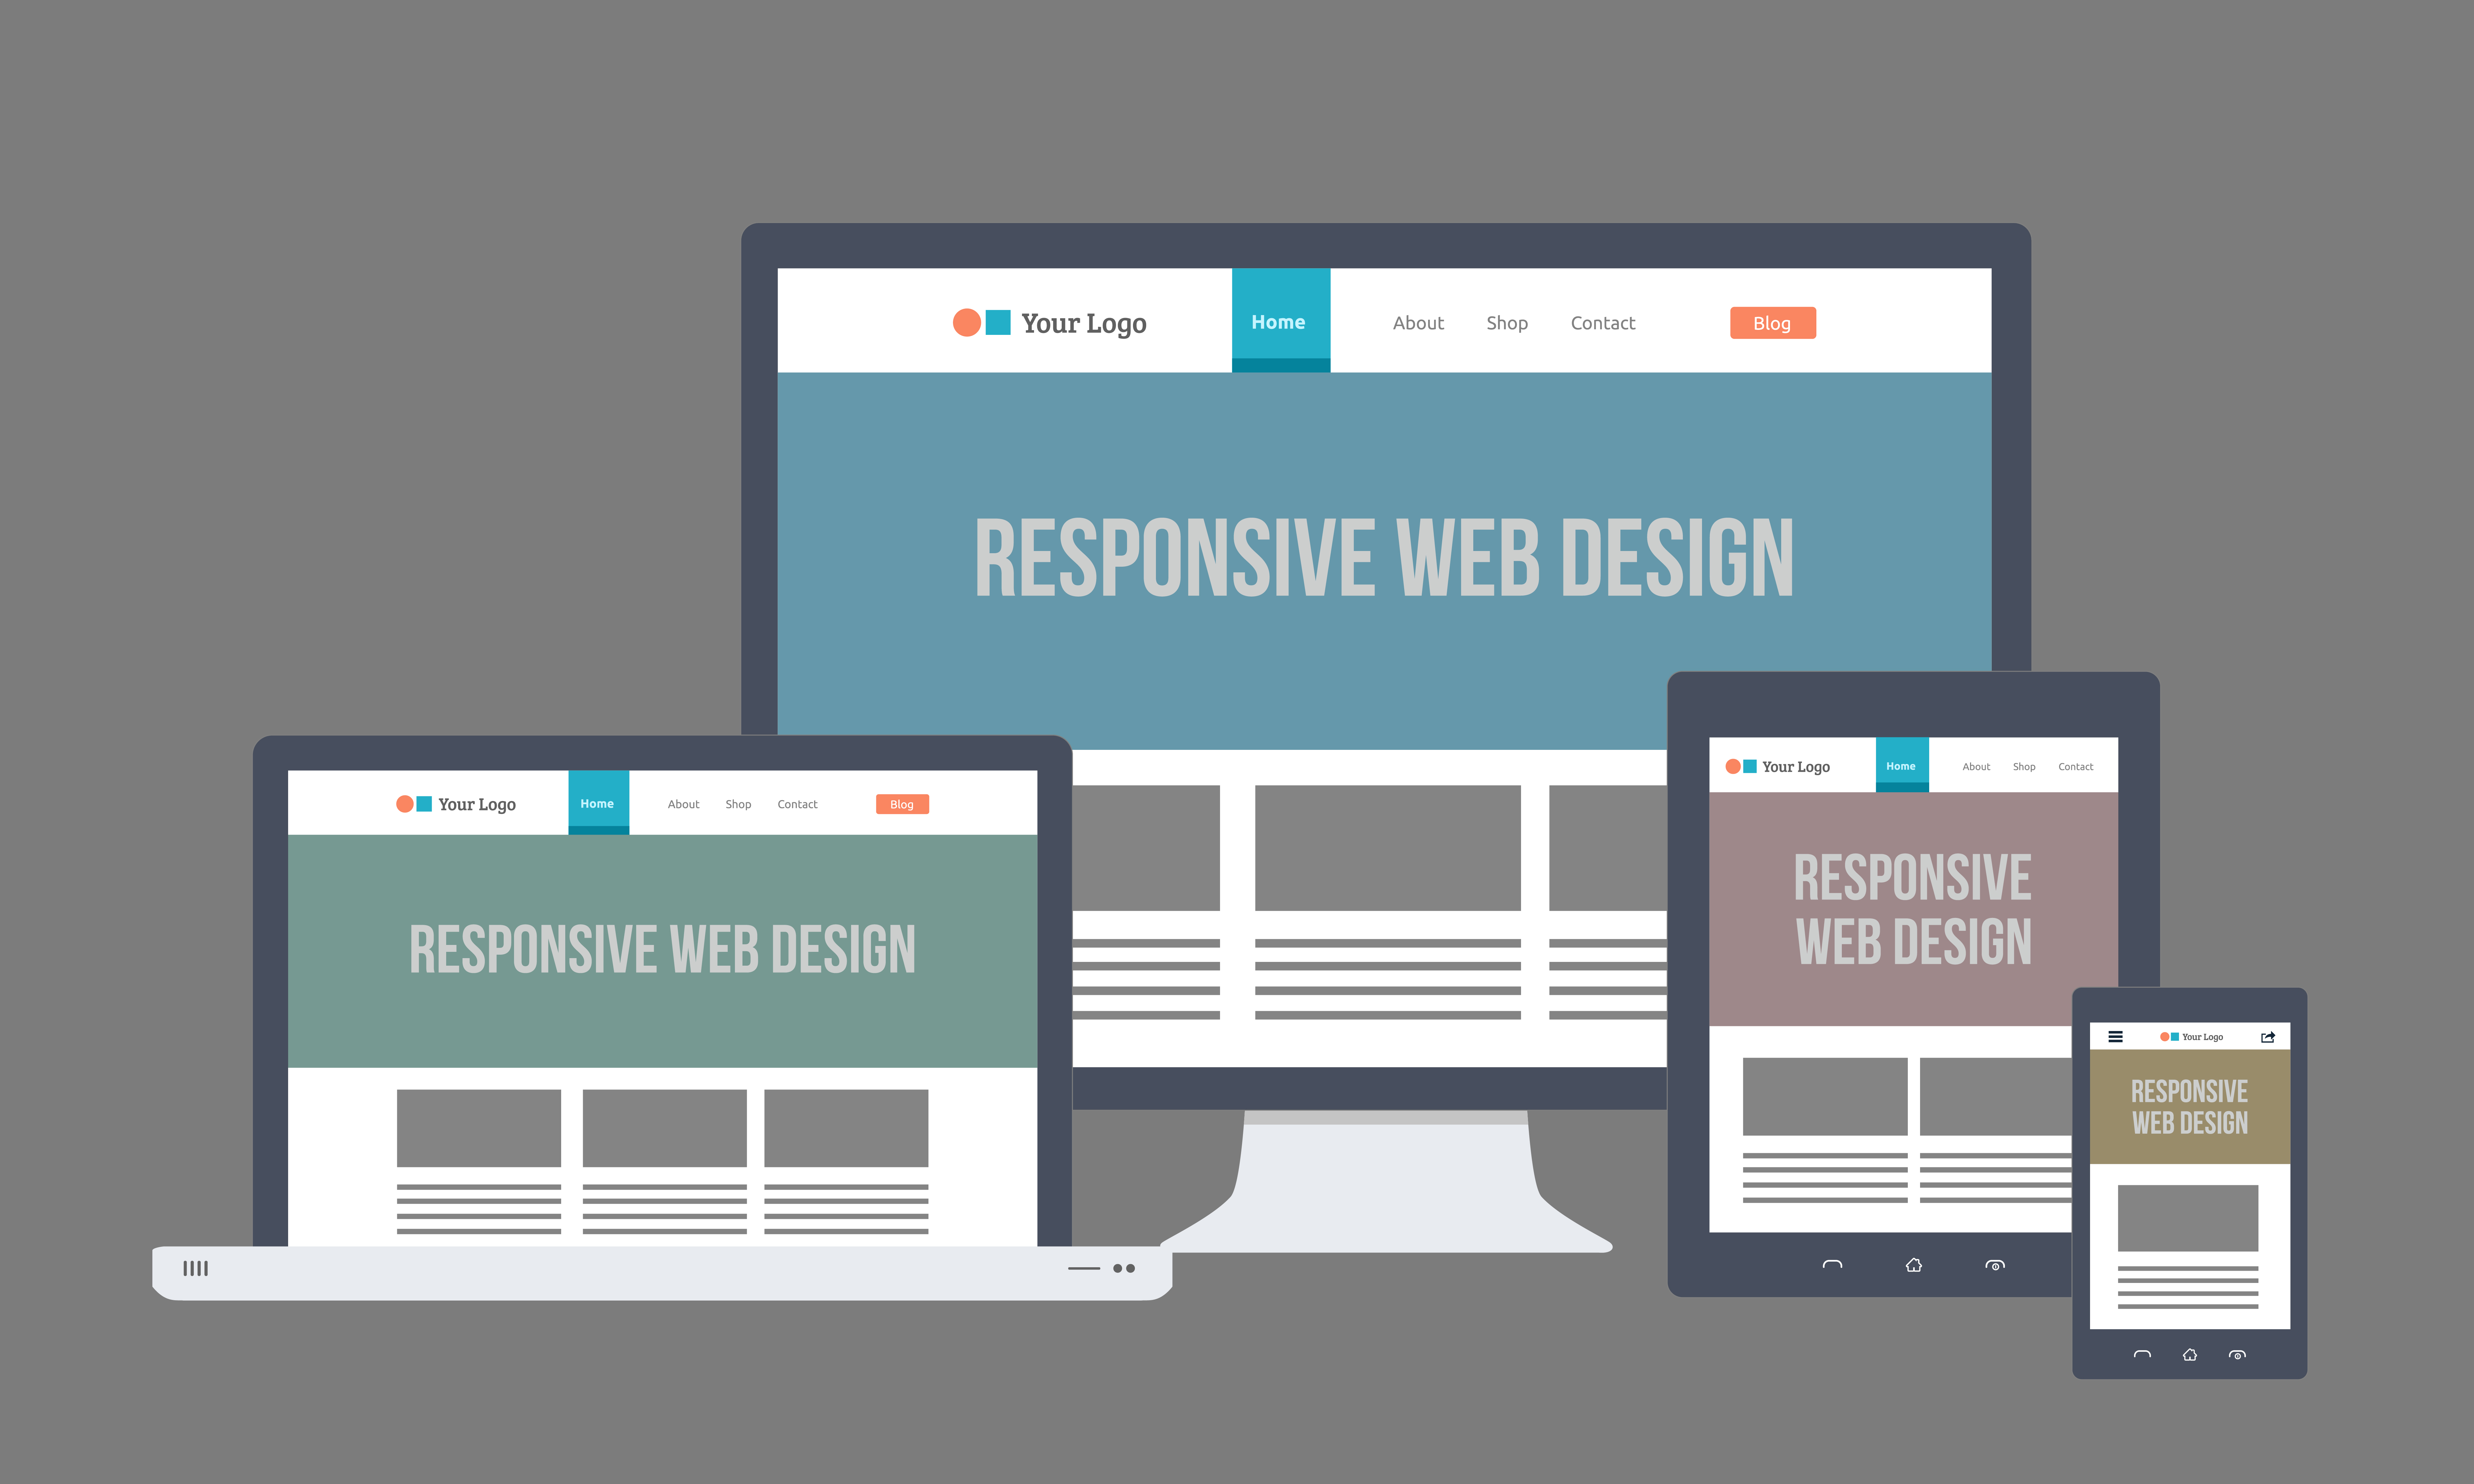 embrace-responsive-web-design.jpg